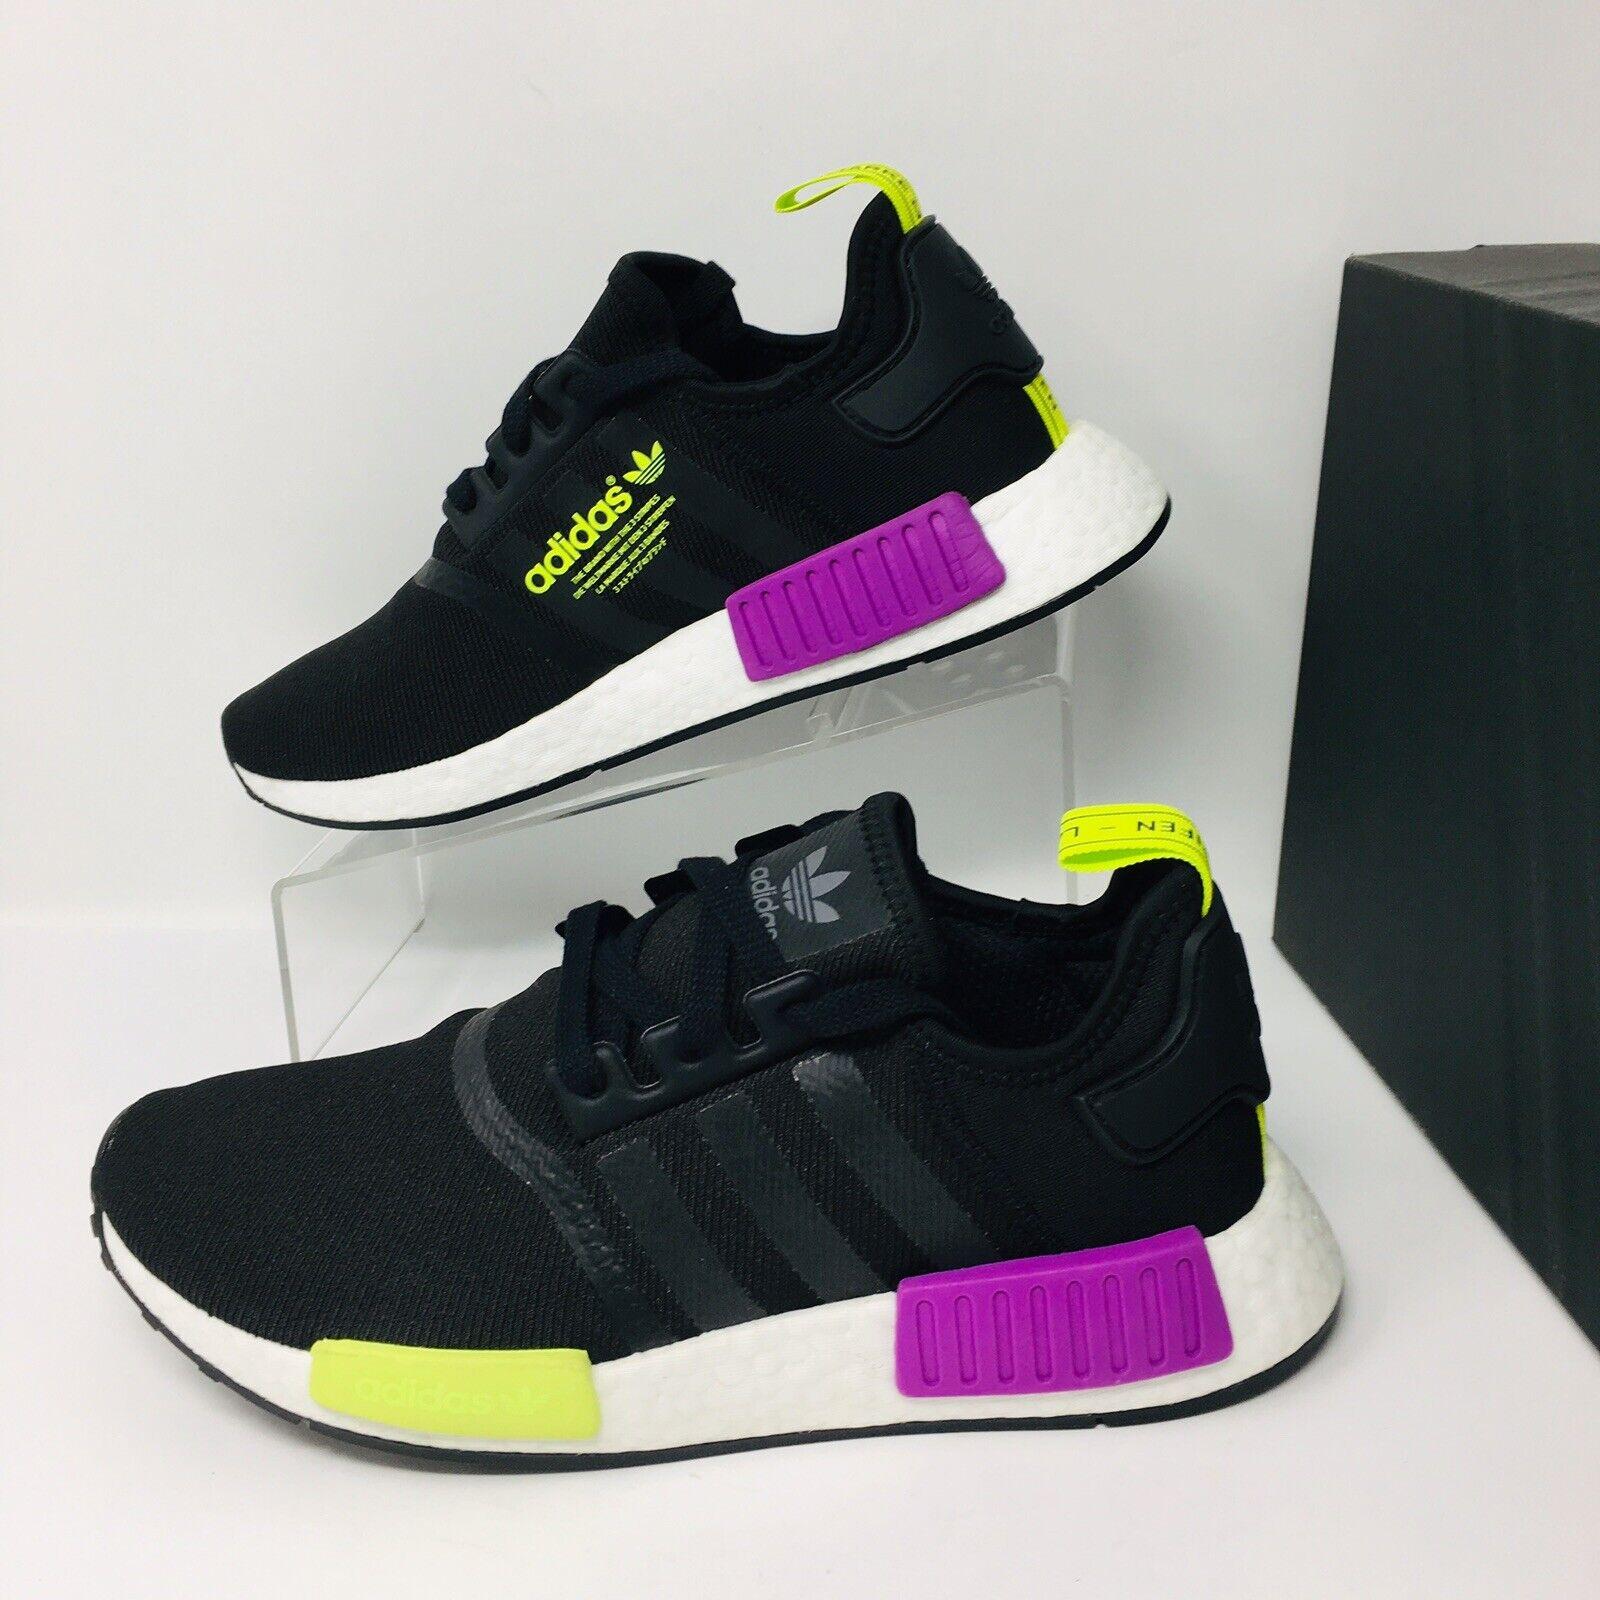 NEW Adidas Original NMD R1 (Men 7) X (Women 8.5) Running Sneakers Ultra Boost